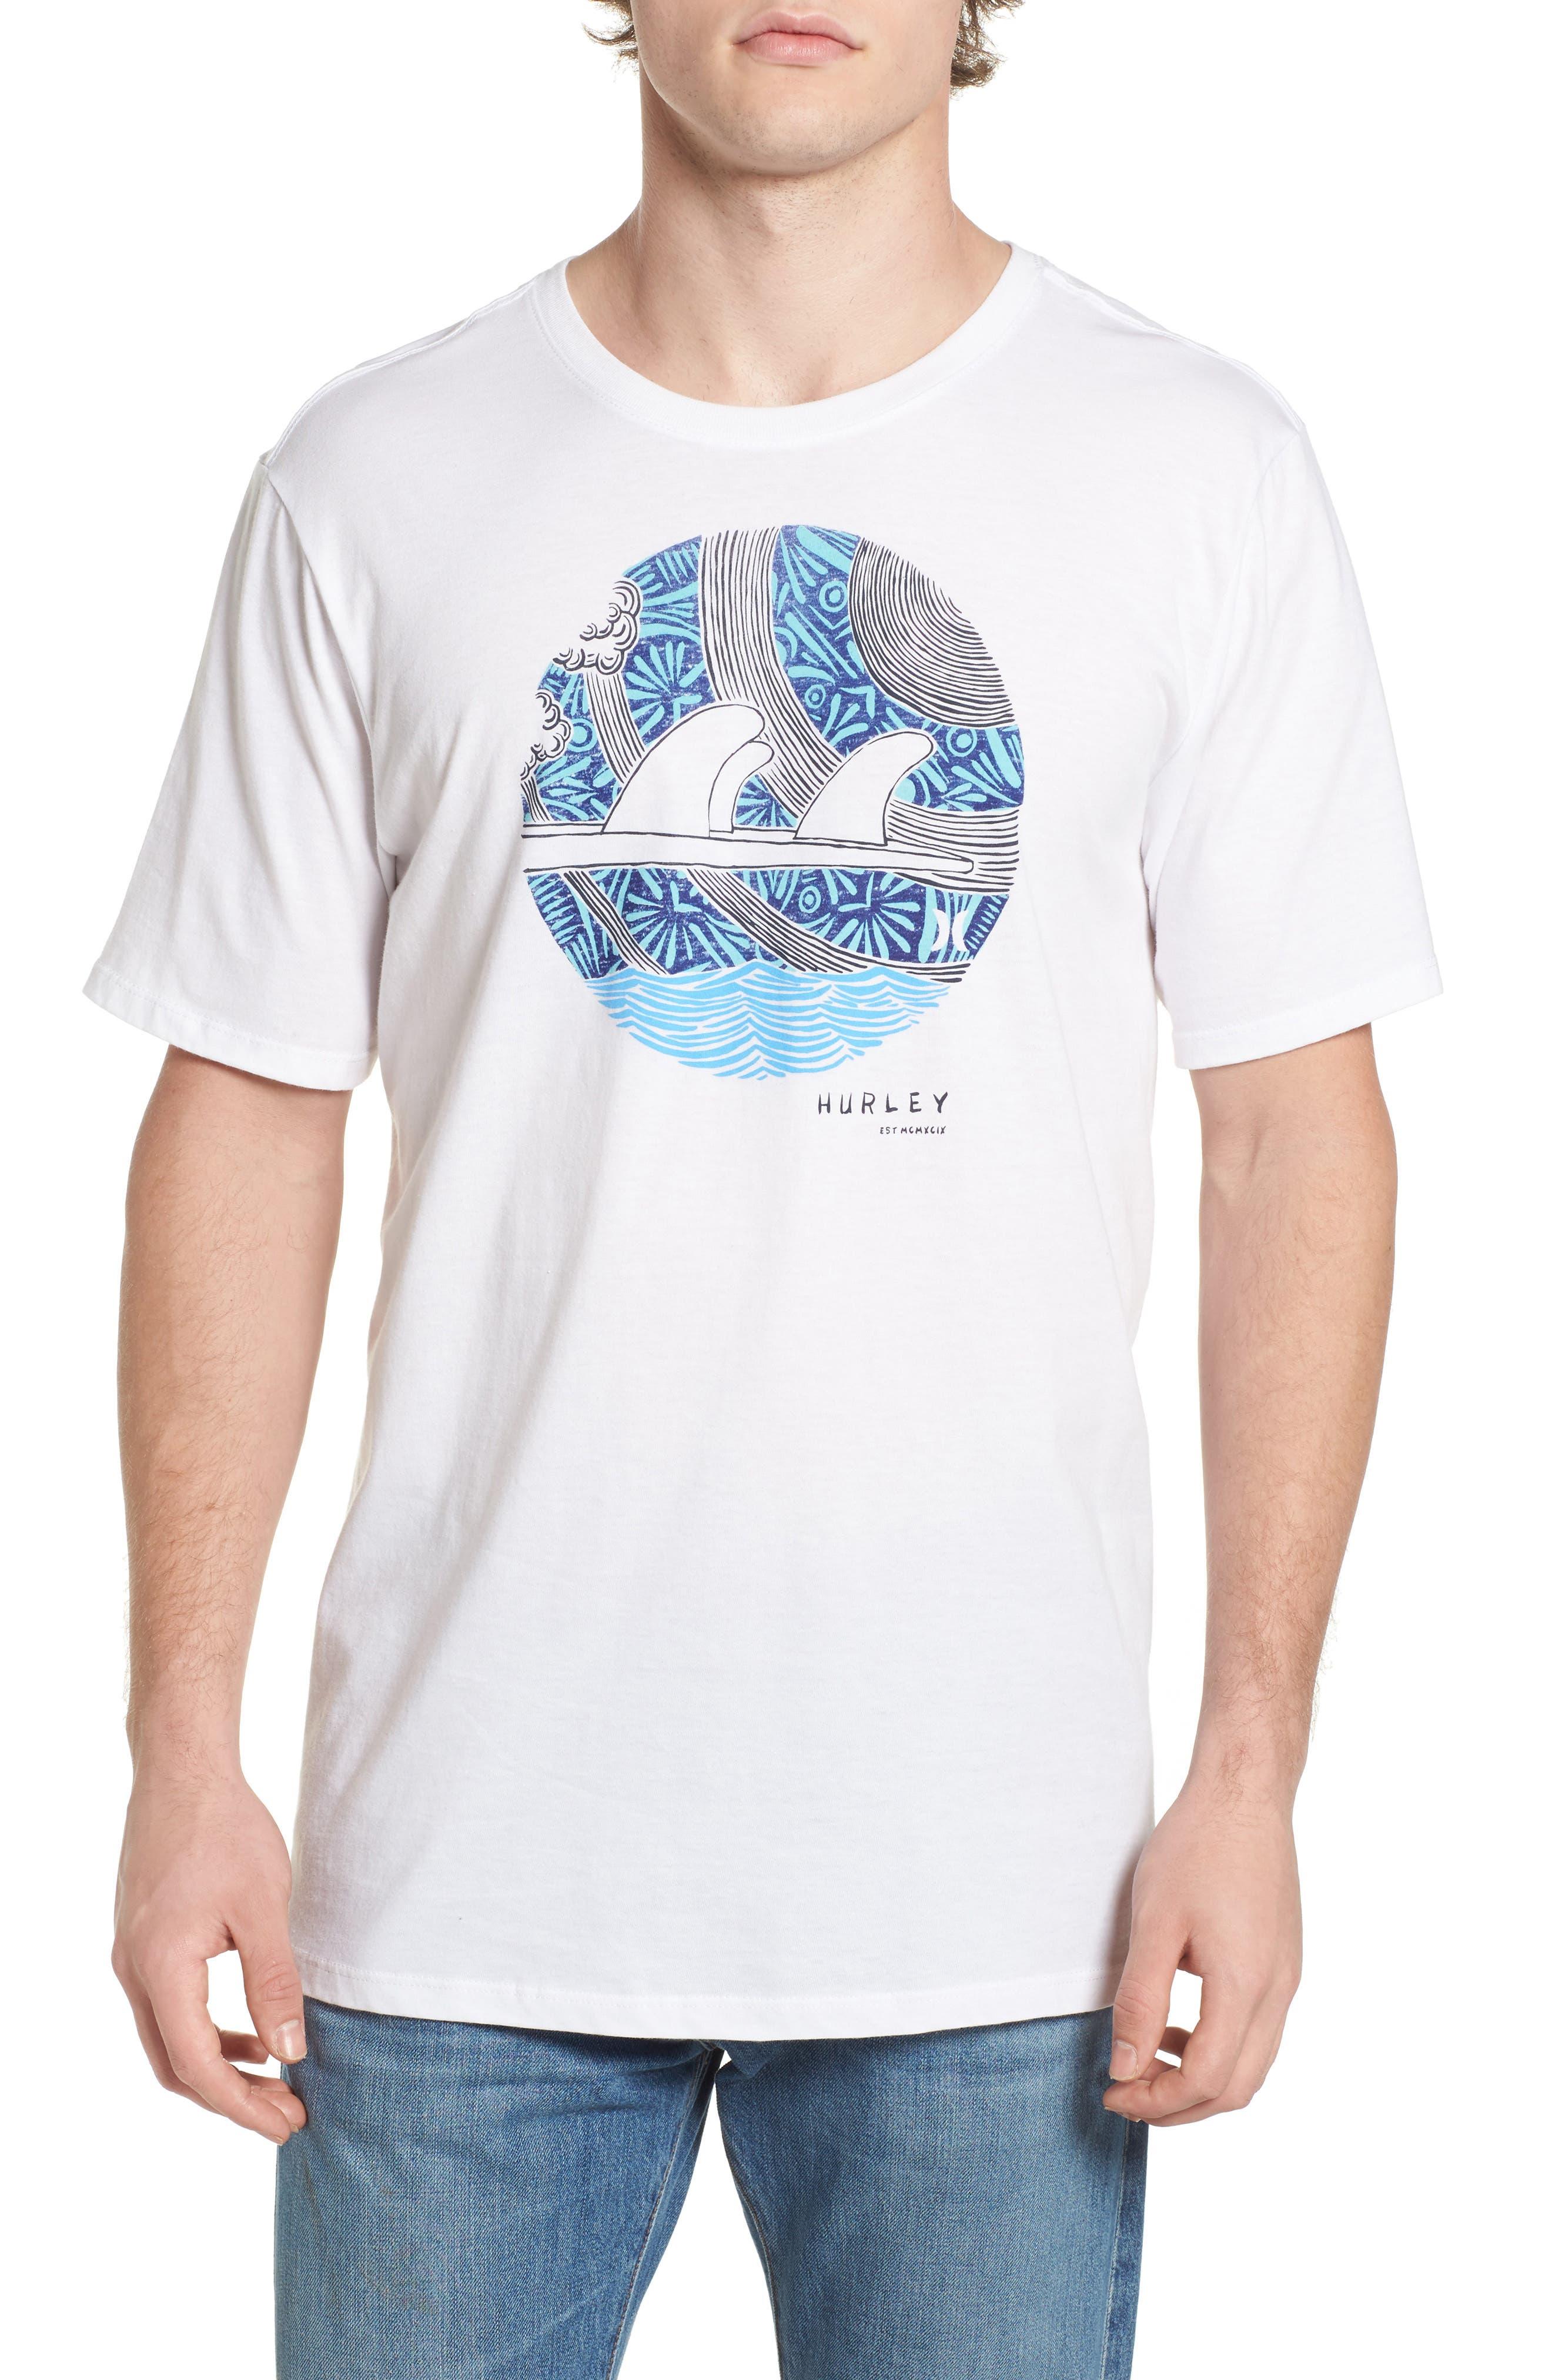 Hurley Surfboard Logo Graphic T-Shirt